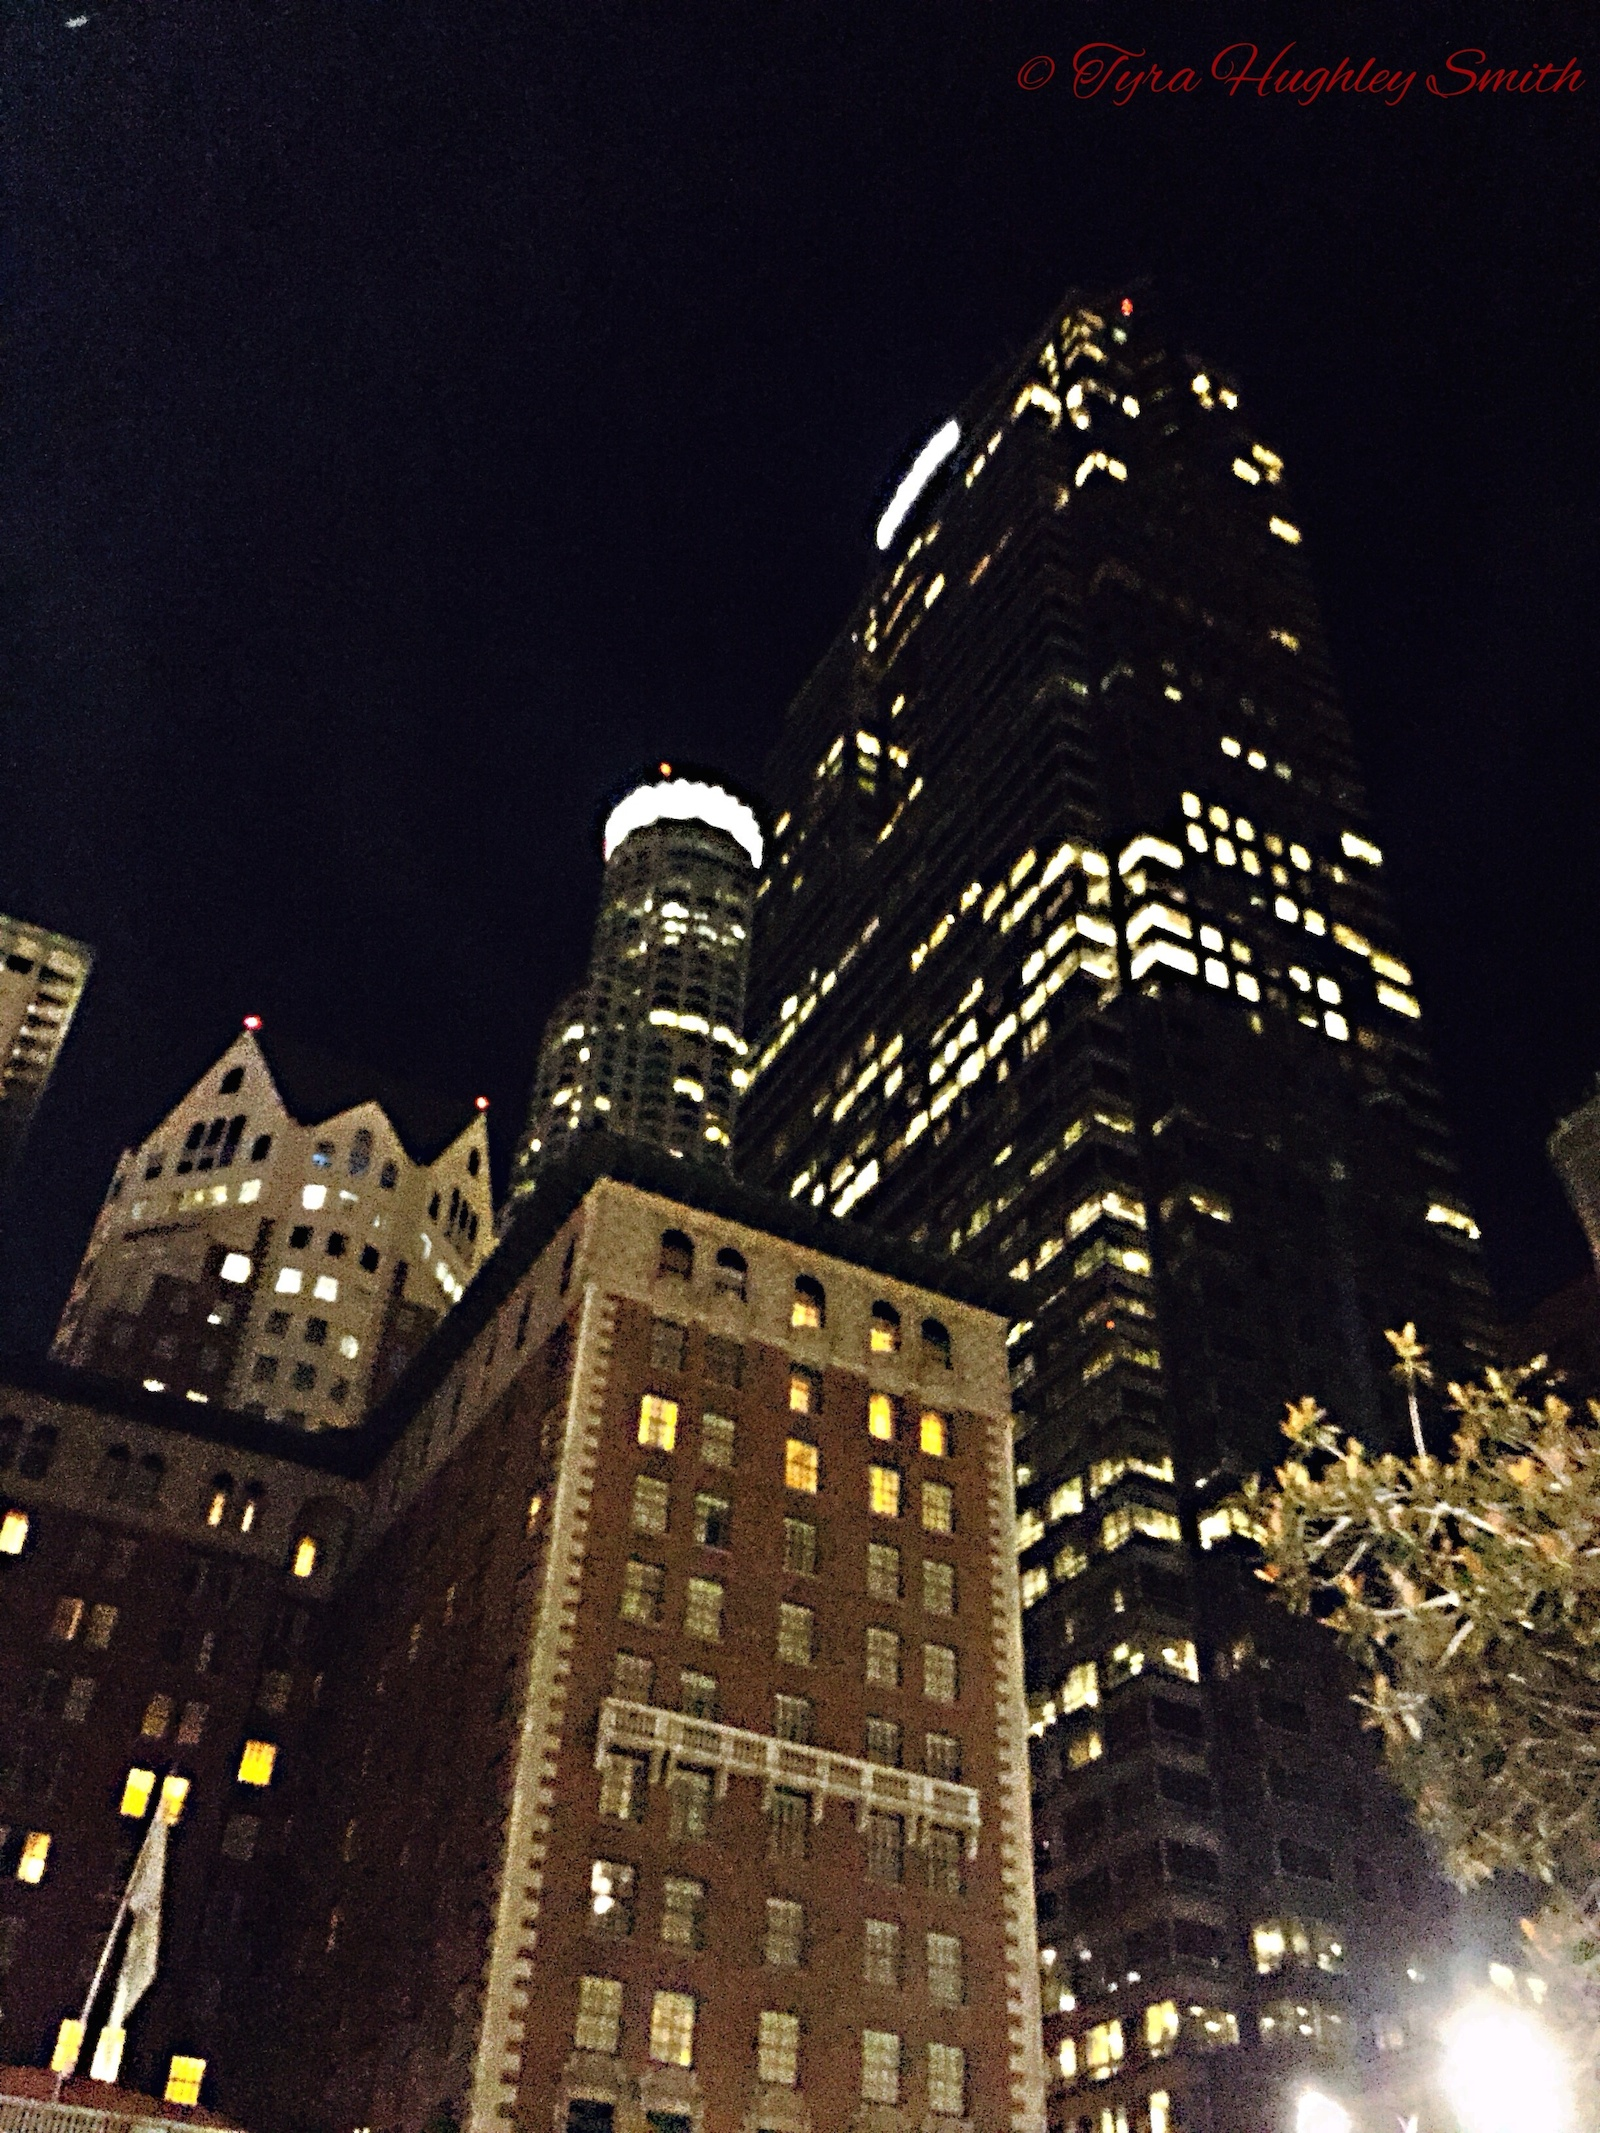 BarrisTourista-Pershing Square night Los Angeles Diner en Blanc 2015